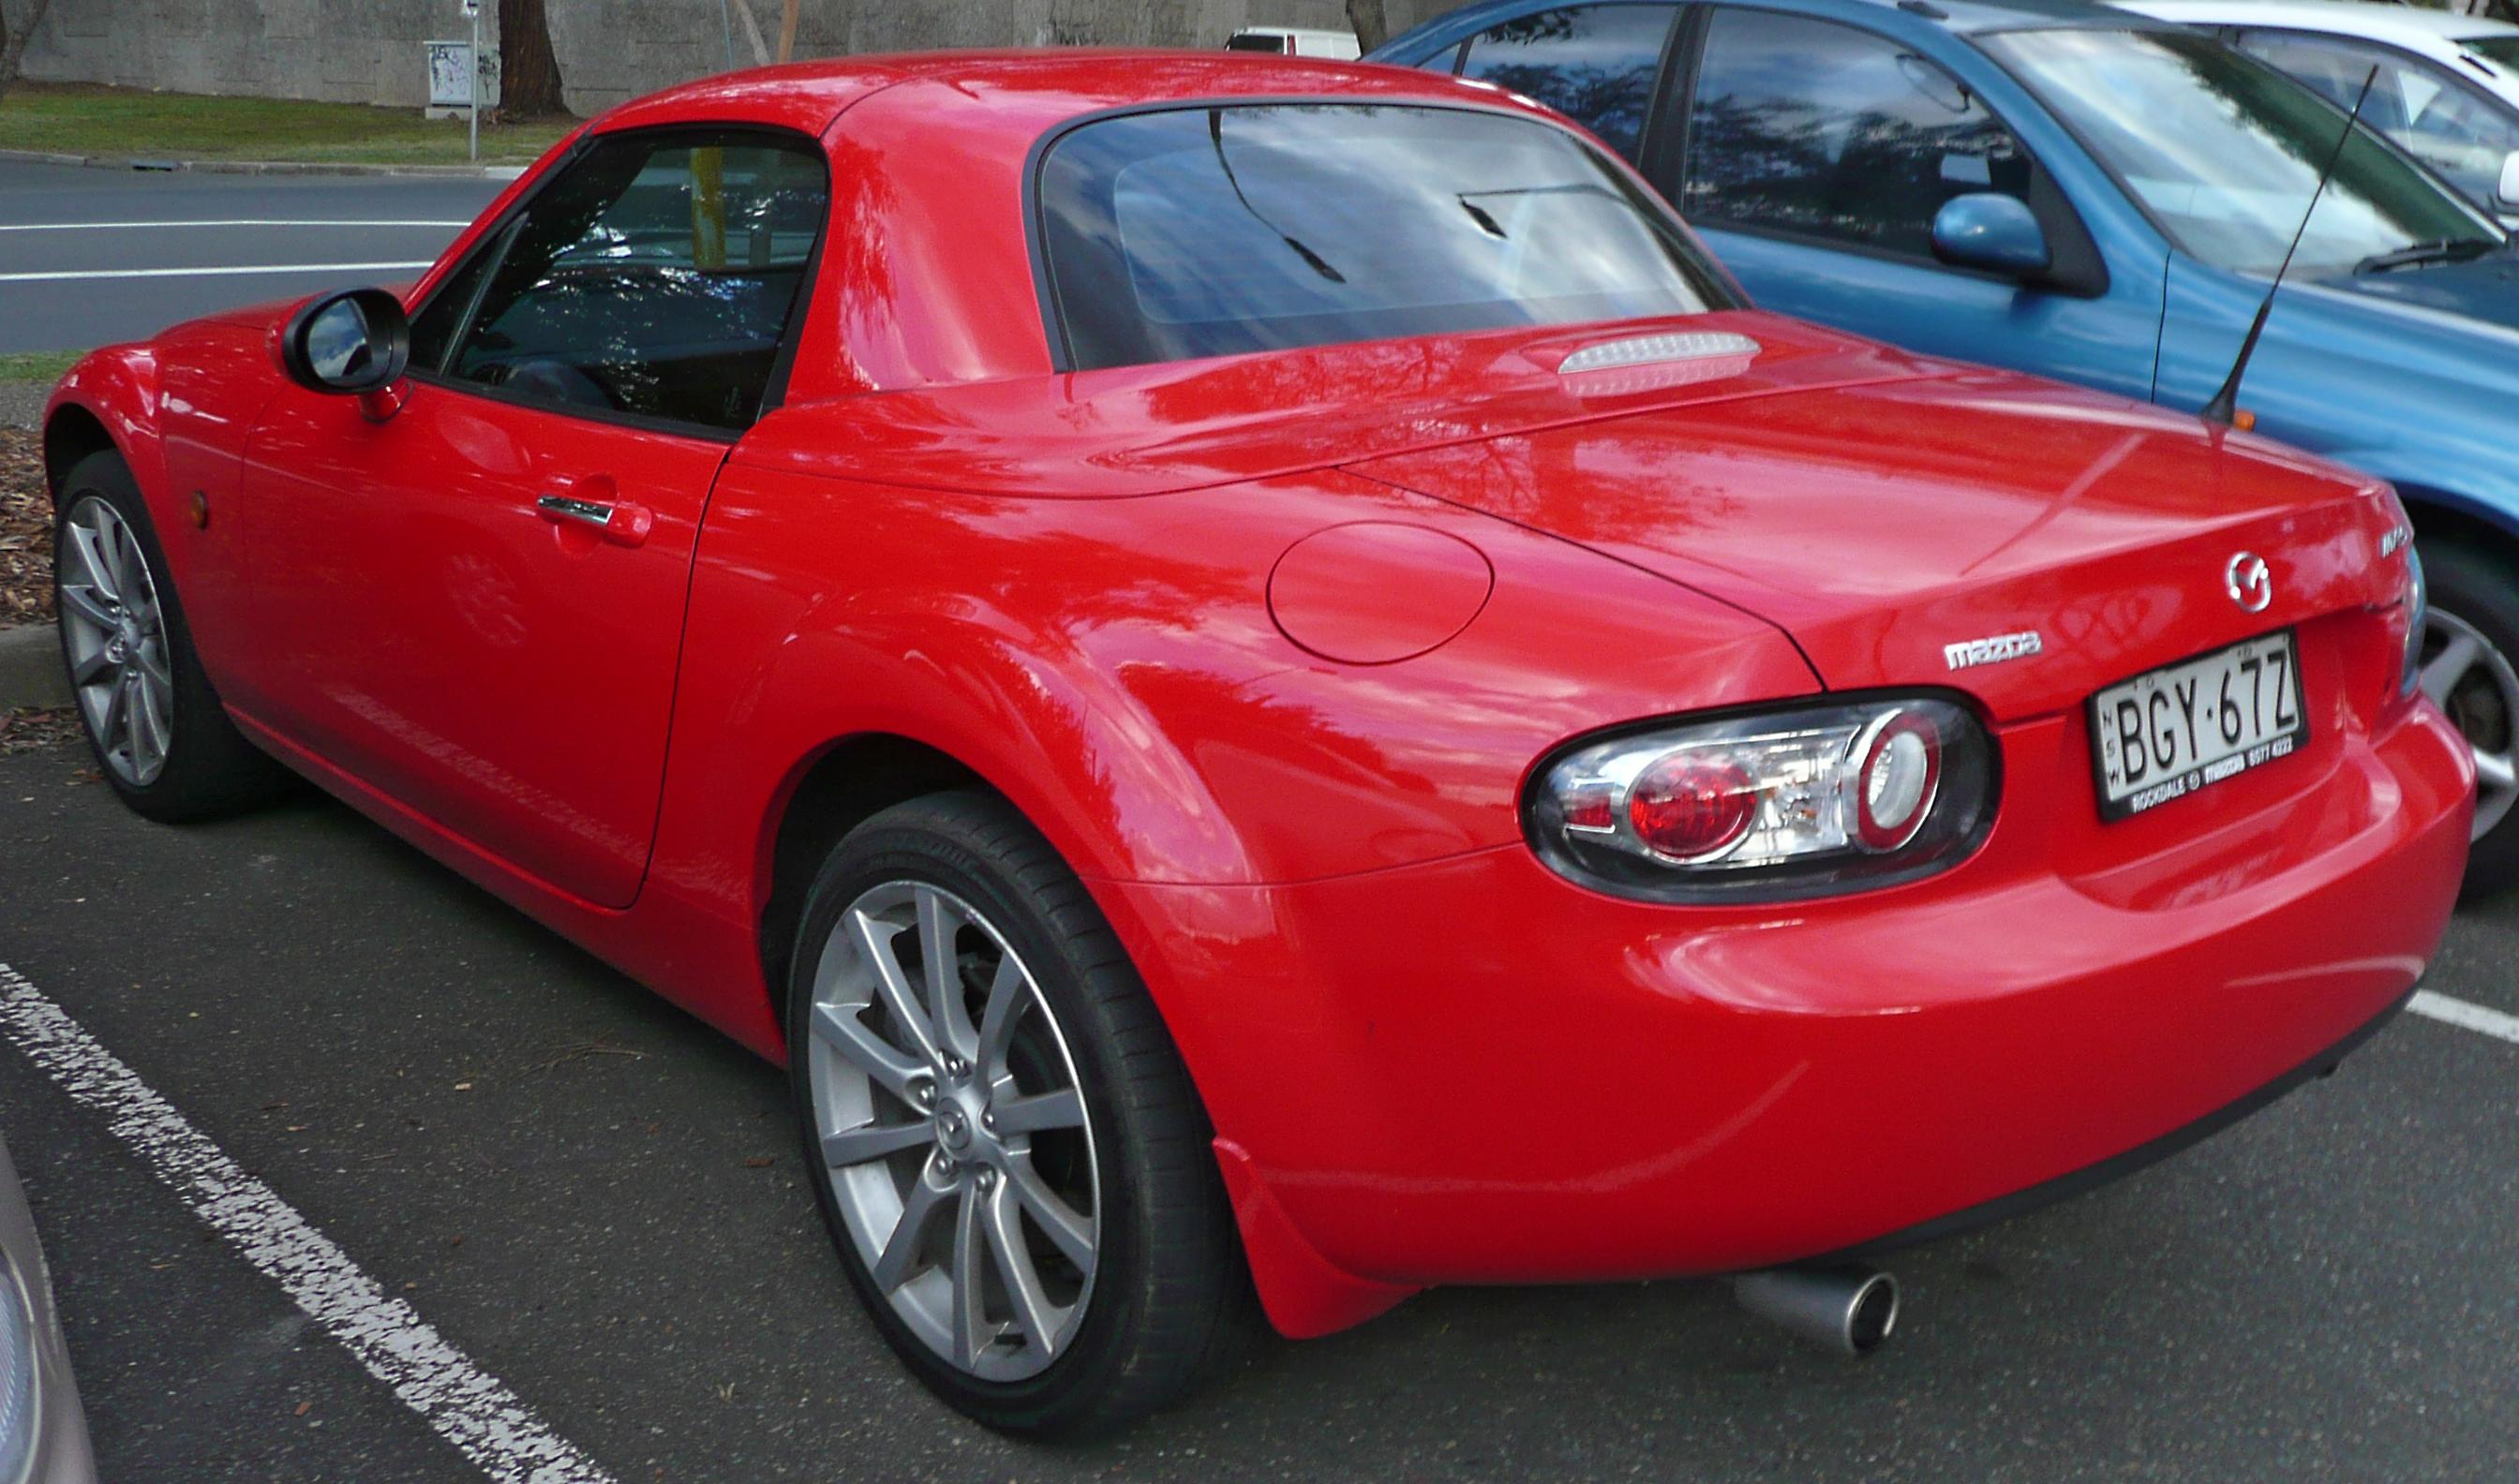 http://carsot.com/images/mazda-mx5-iii-nc-2005-2009-roadster-exterior-2.jpg